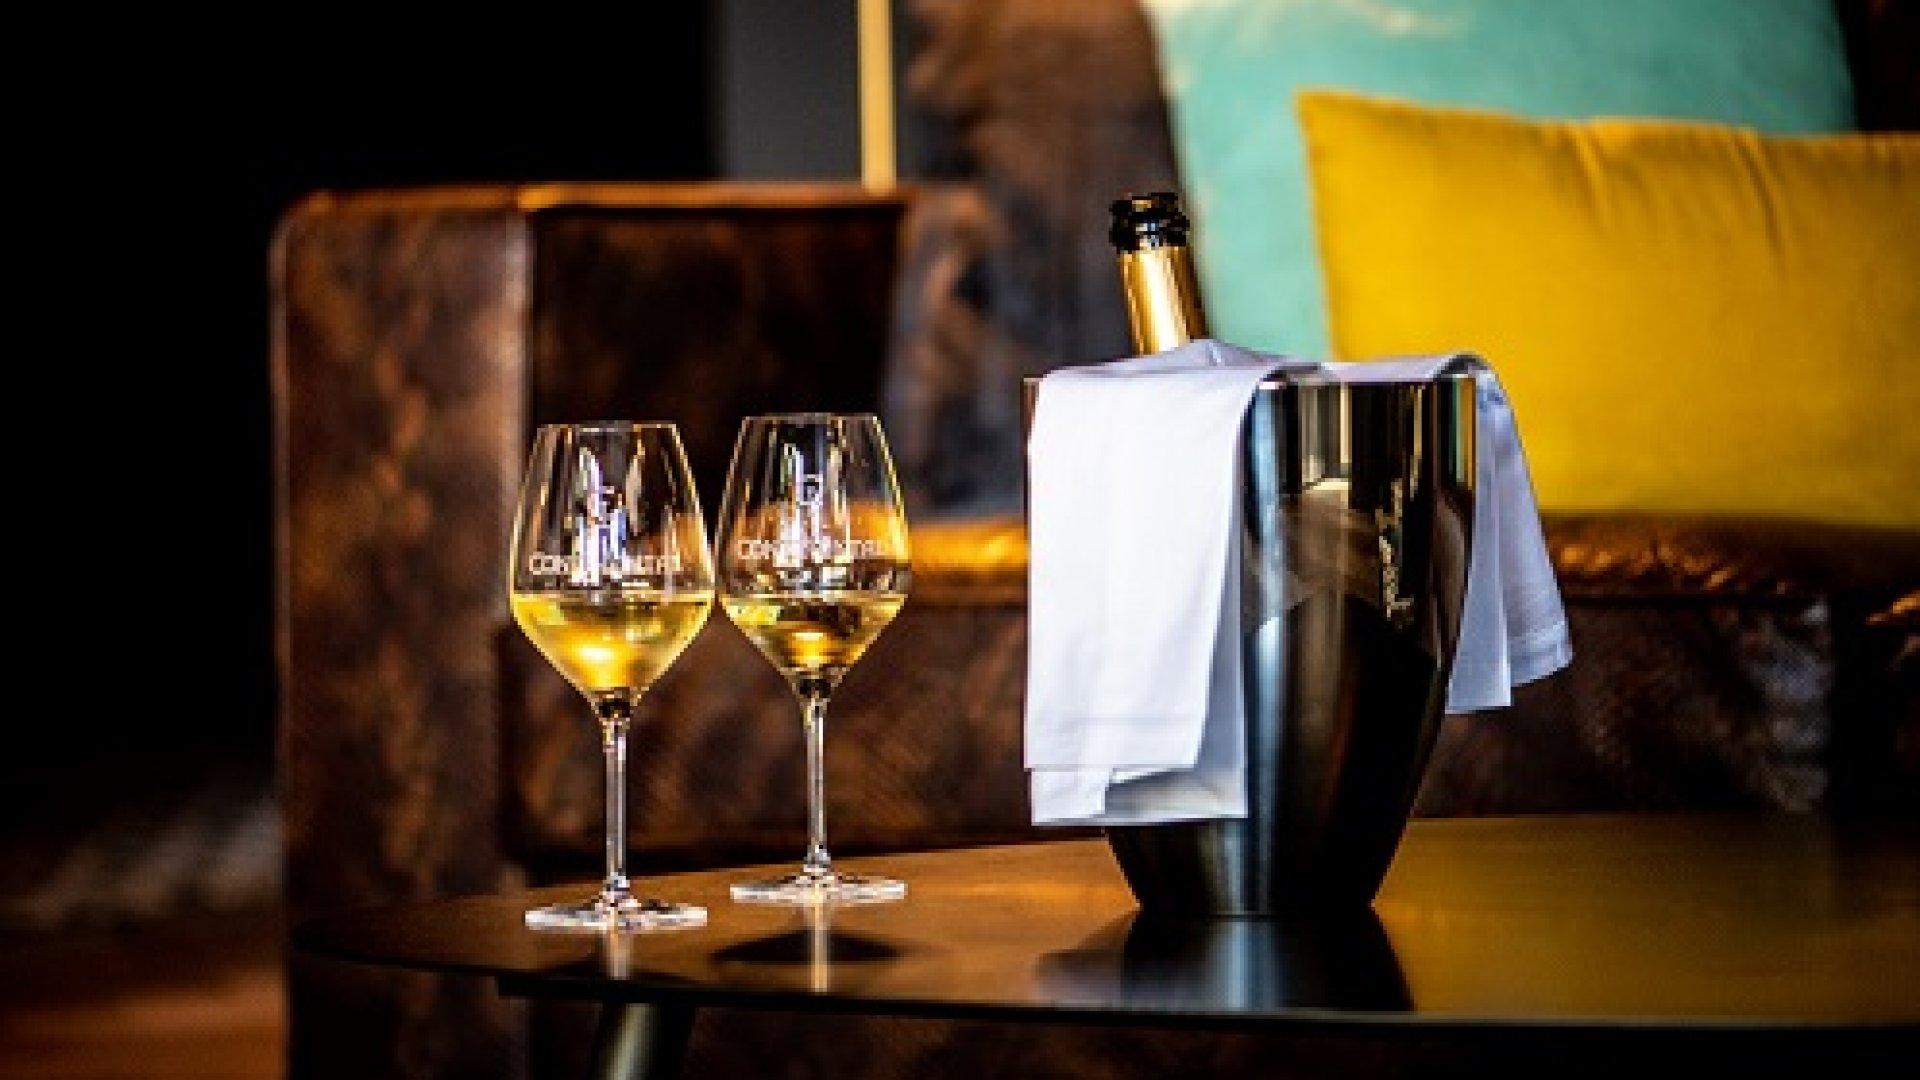 Accueil champagne 1